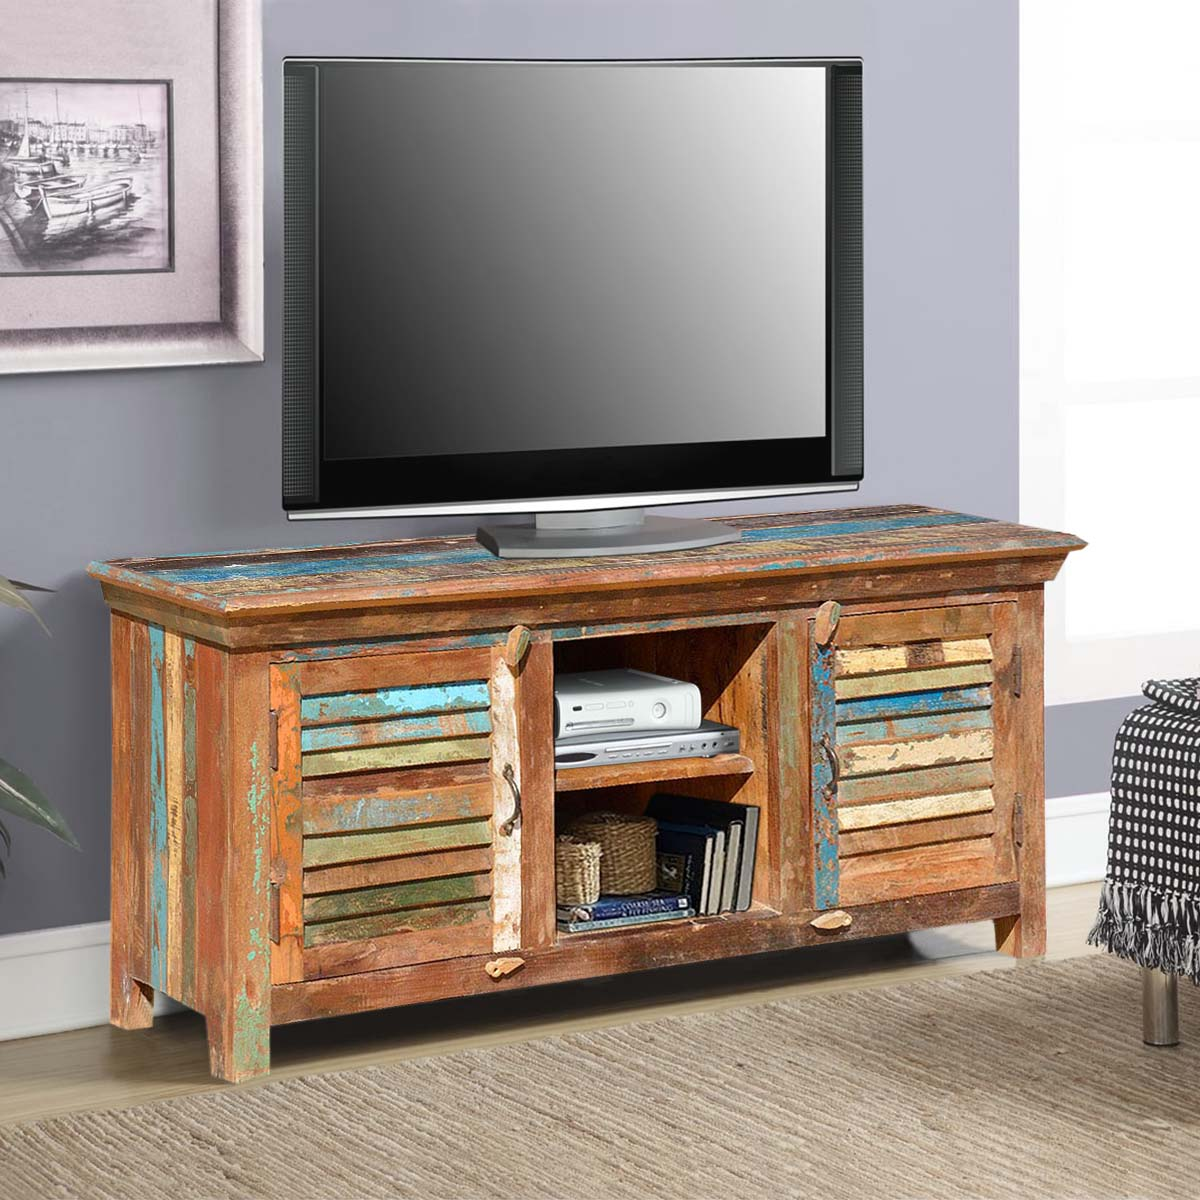 Bertrand Rustic Primitive Reclaimed Wood Tv Stand Media Cabinet